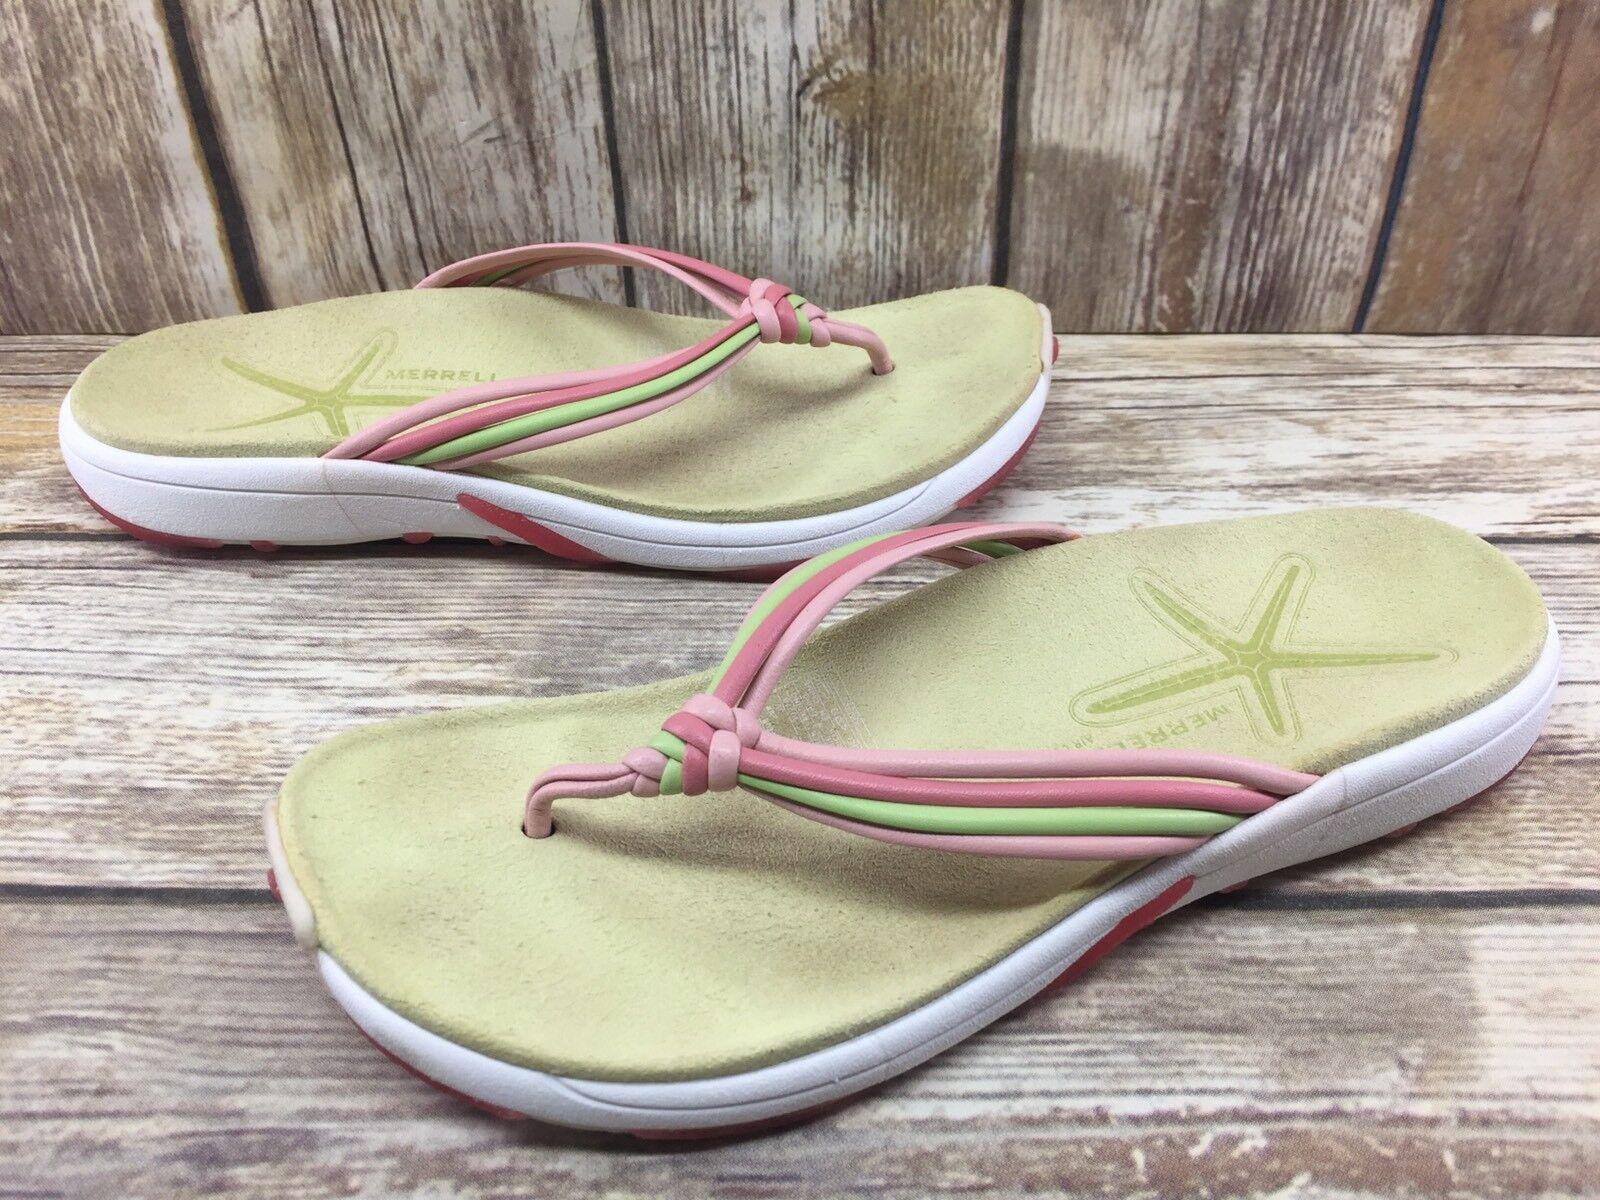 Merrell Kai Flops Pink/Green Strappy Rubber Flip Flops Kai Sandals Women's sz 8 8cf4c0